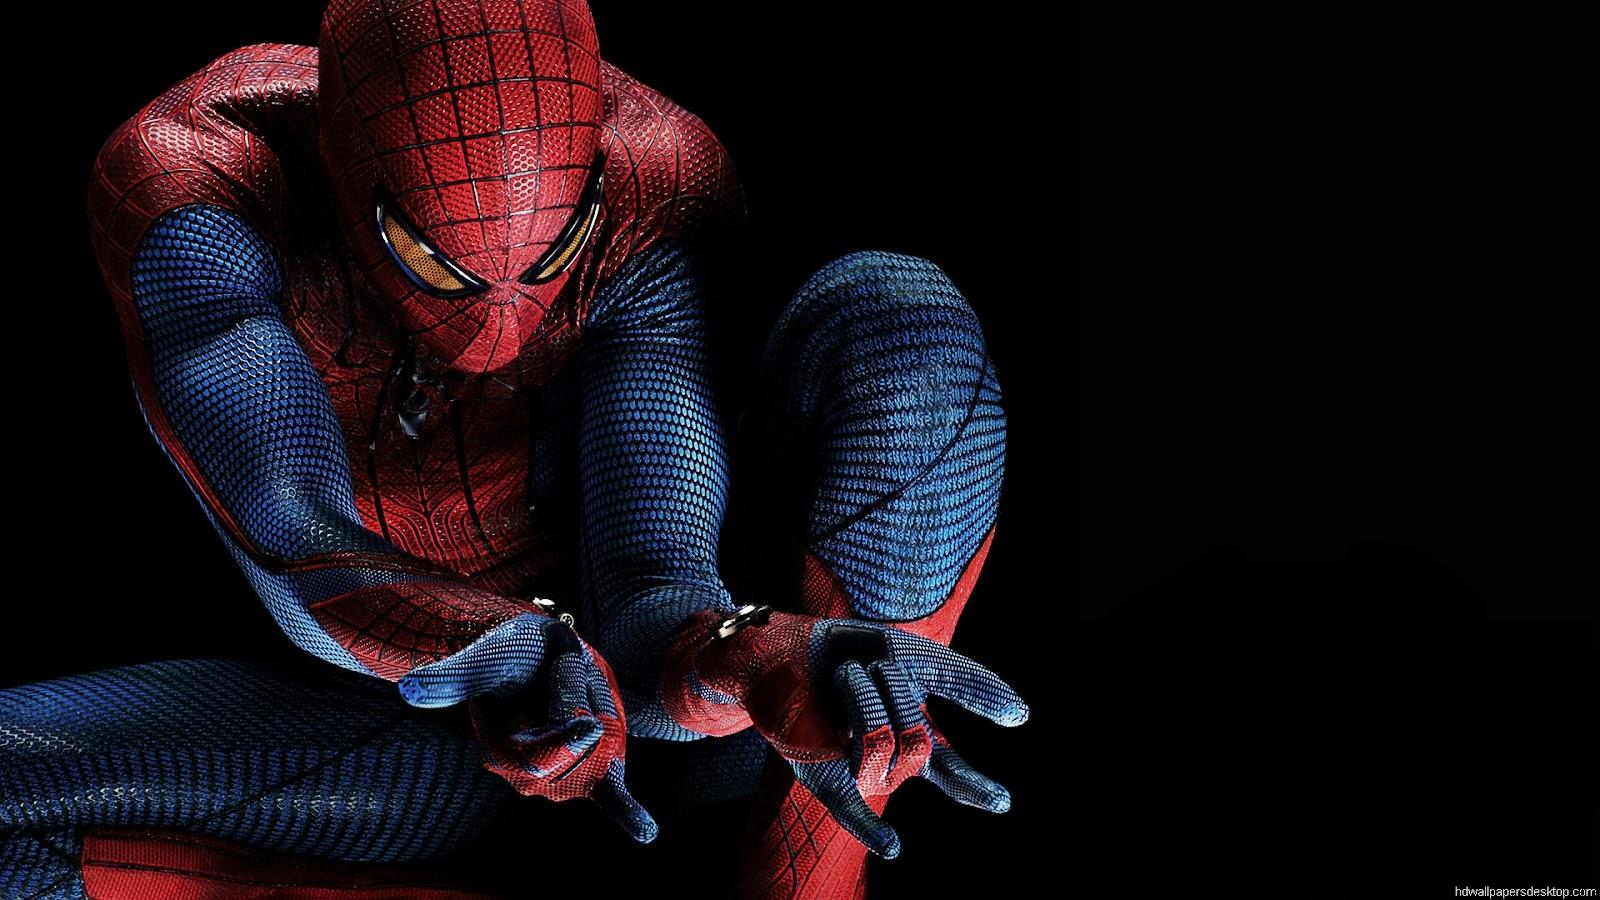 Wallpaper Spiderman HD | Deloiz Wallpaper